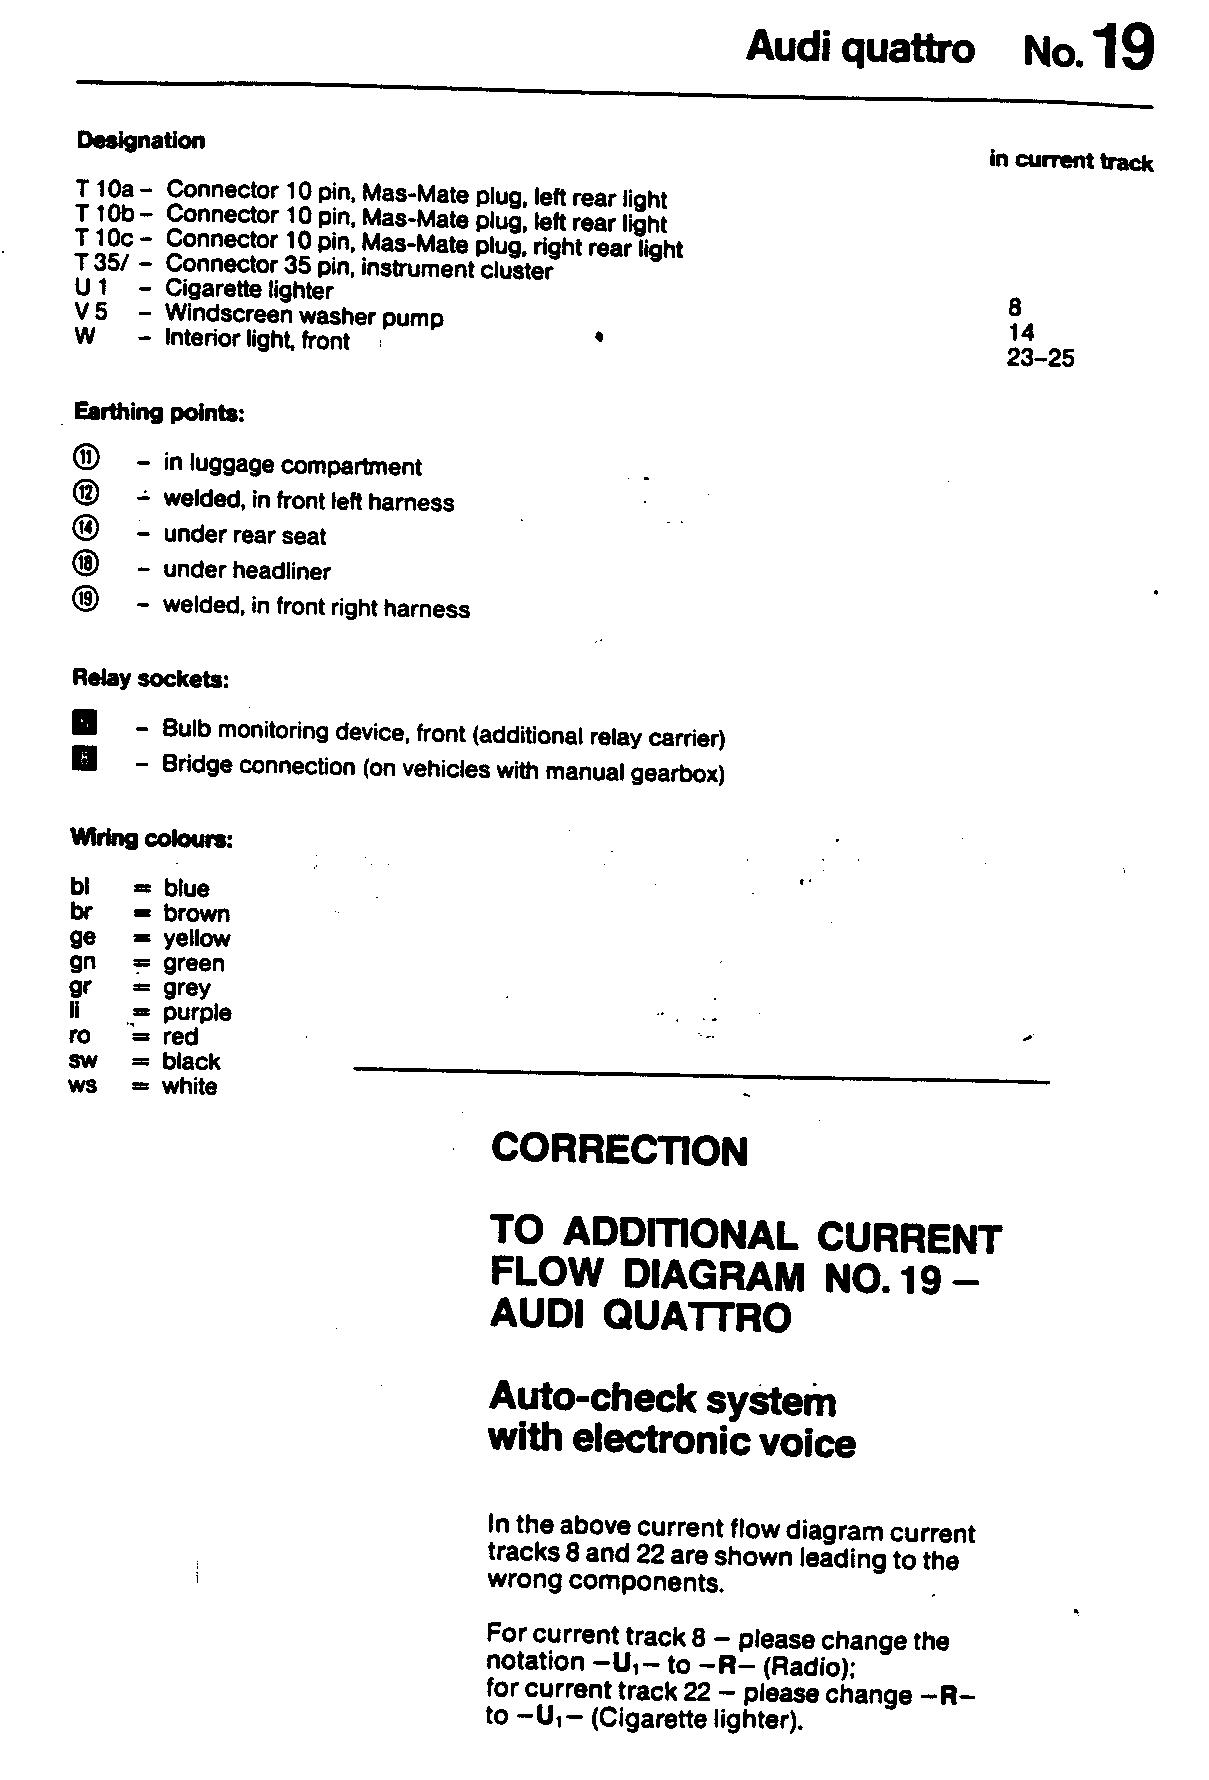 Audi Ur Quattro 1985 Wiring Diagrams Diagram For Cigarette Lighter 19 Auto Check With Voice Index 2